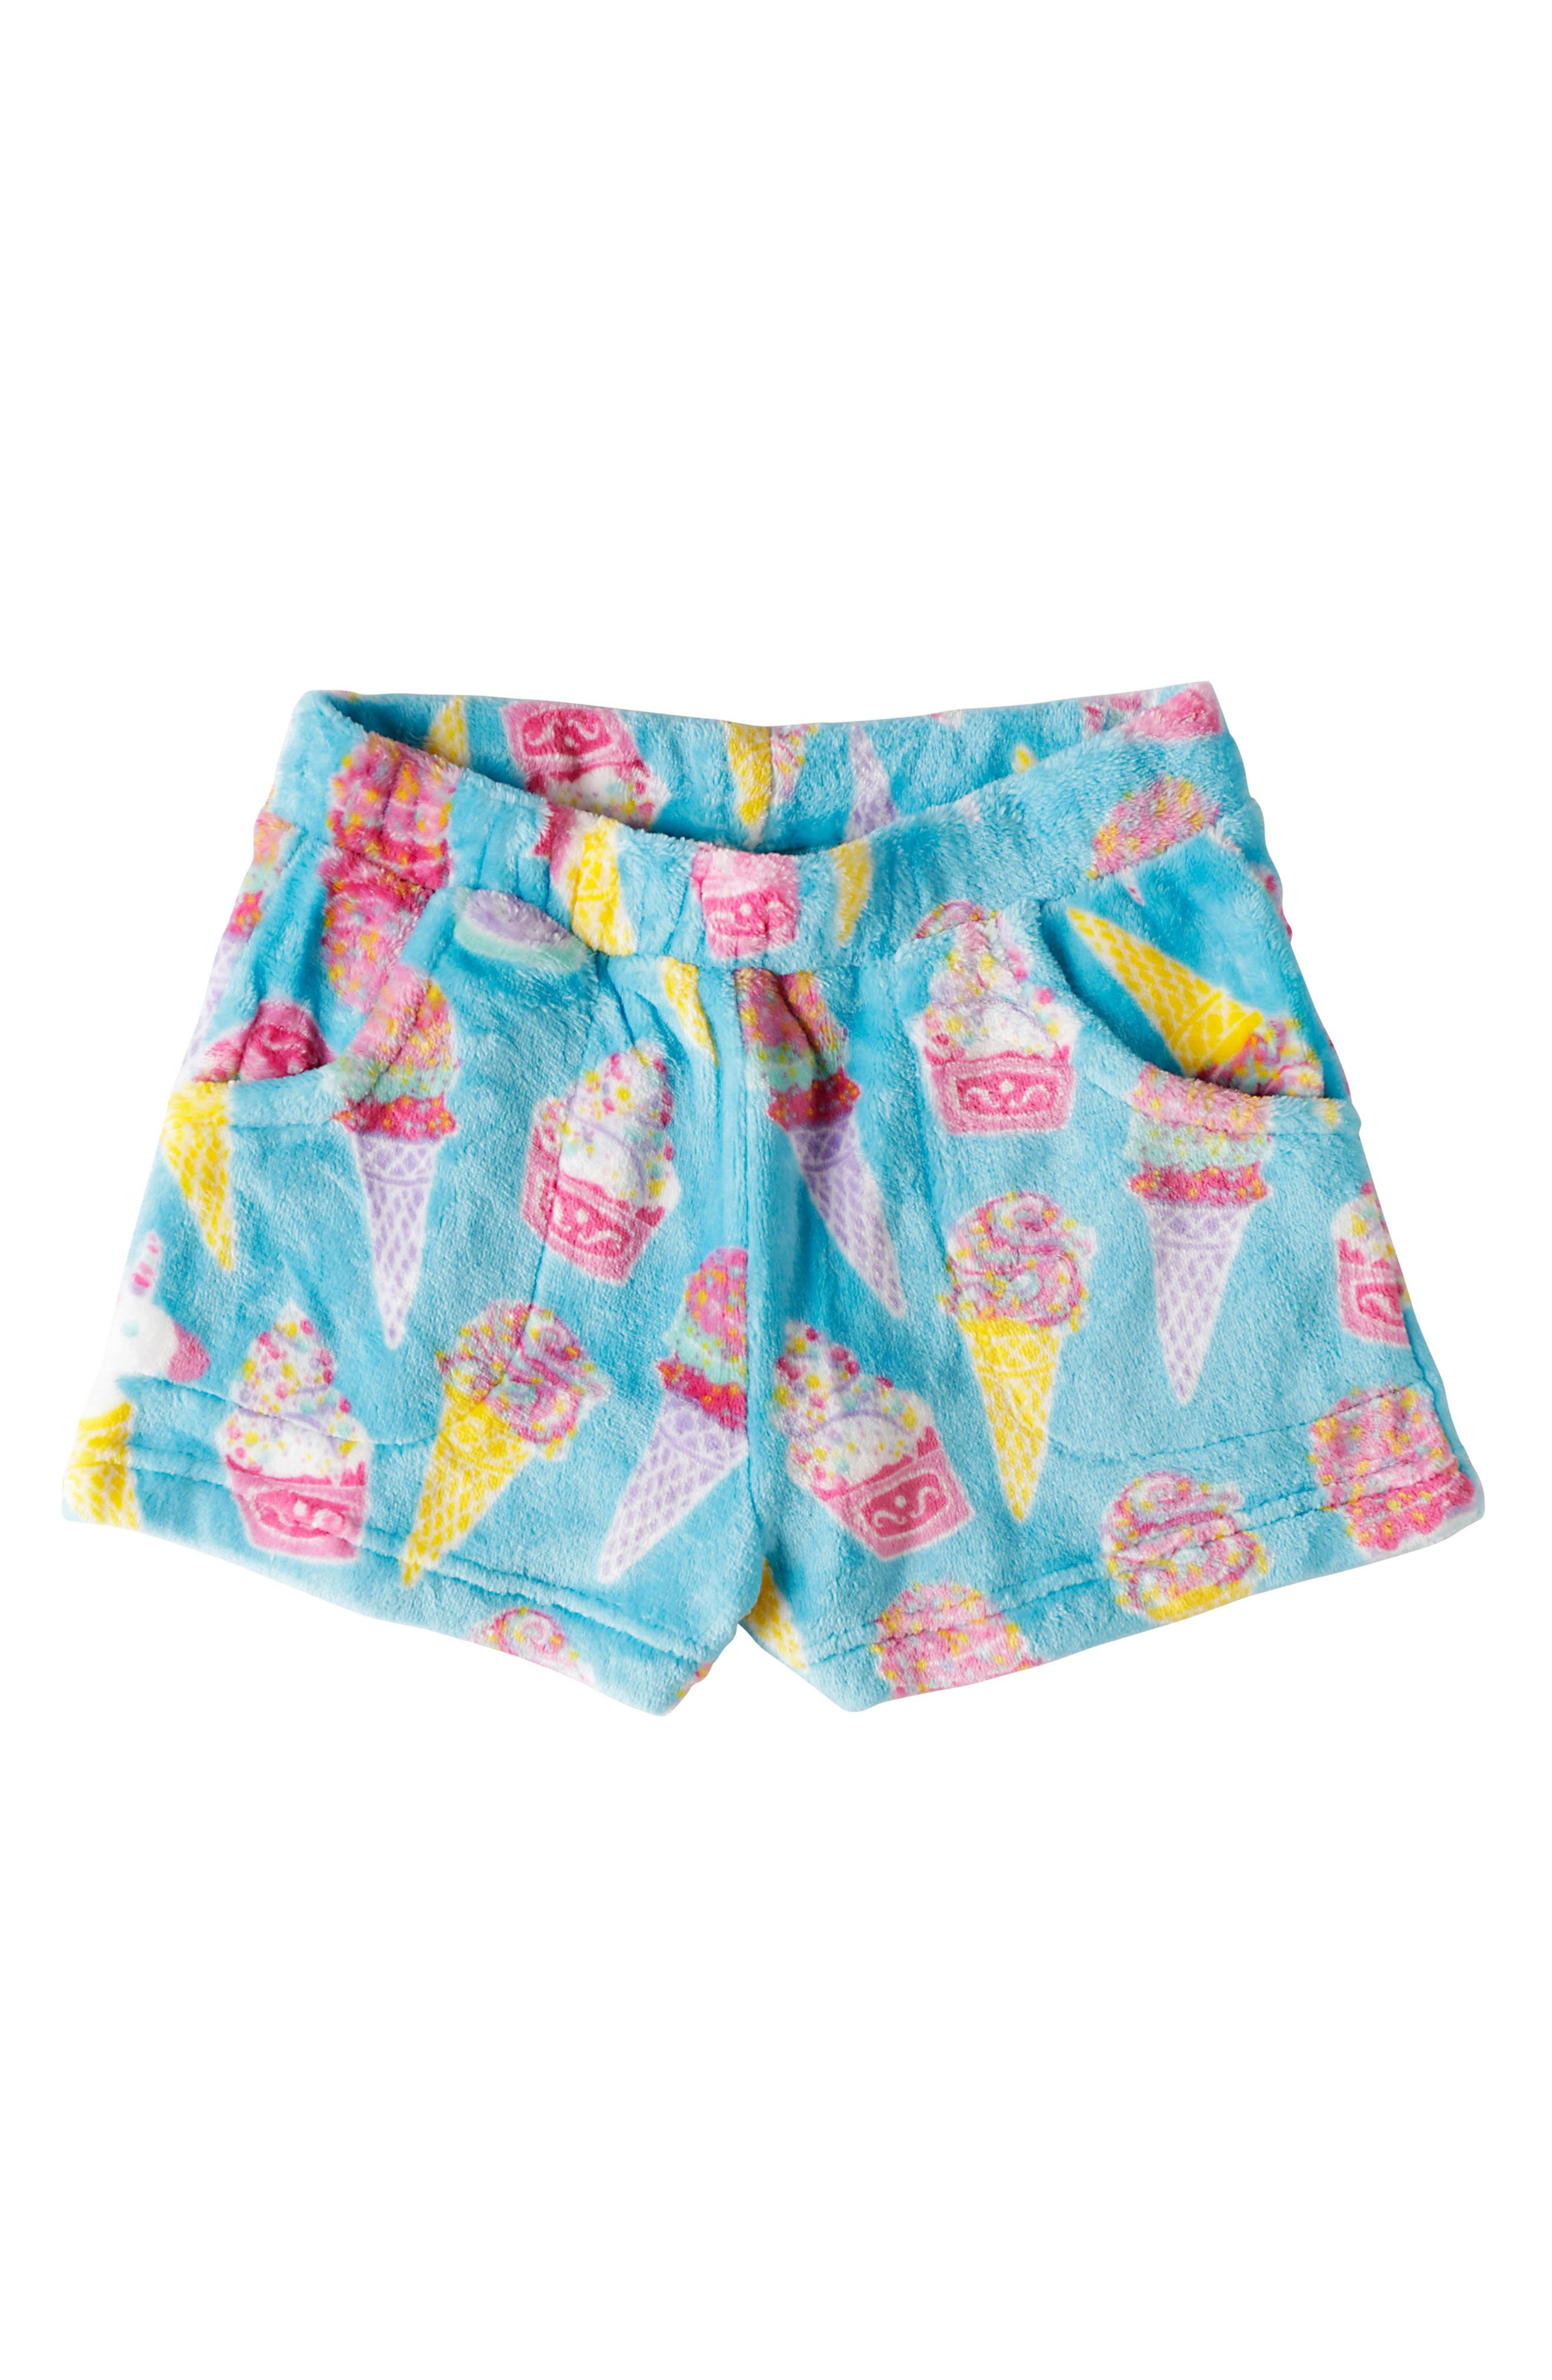 Ice Cream Fleece Pajama Shorts,                             Main thumbnail 1, color,                             440